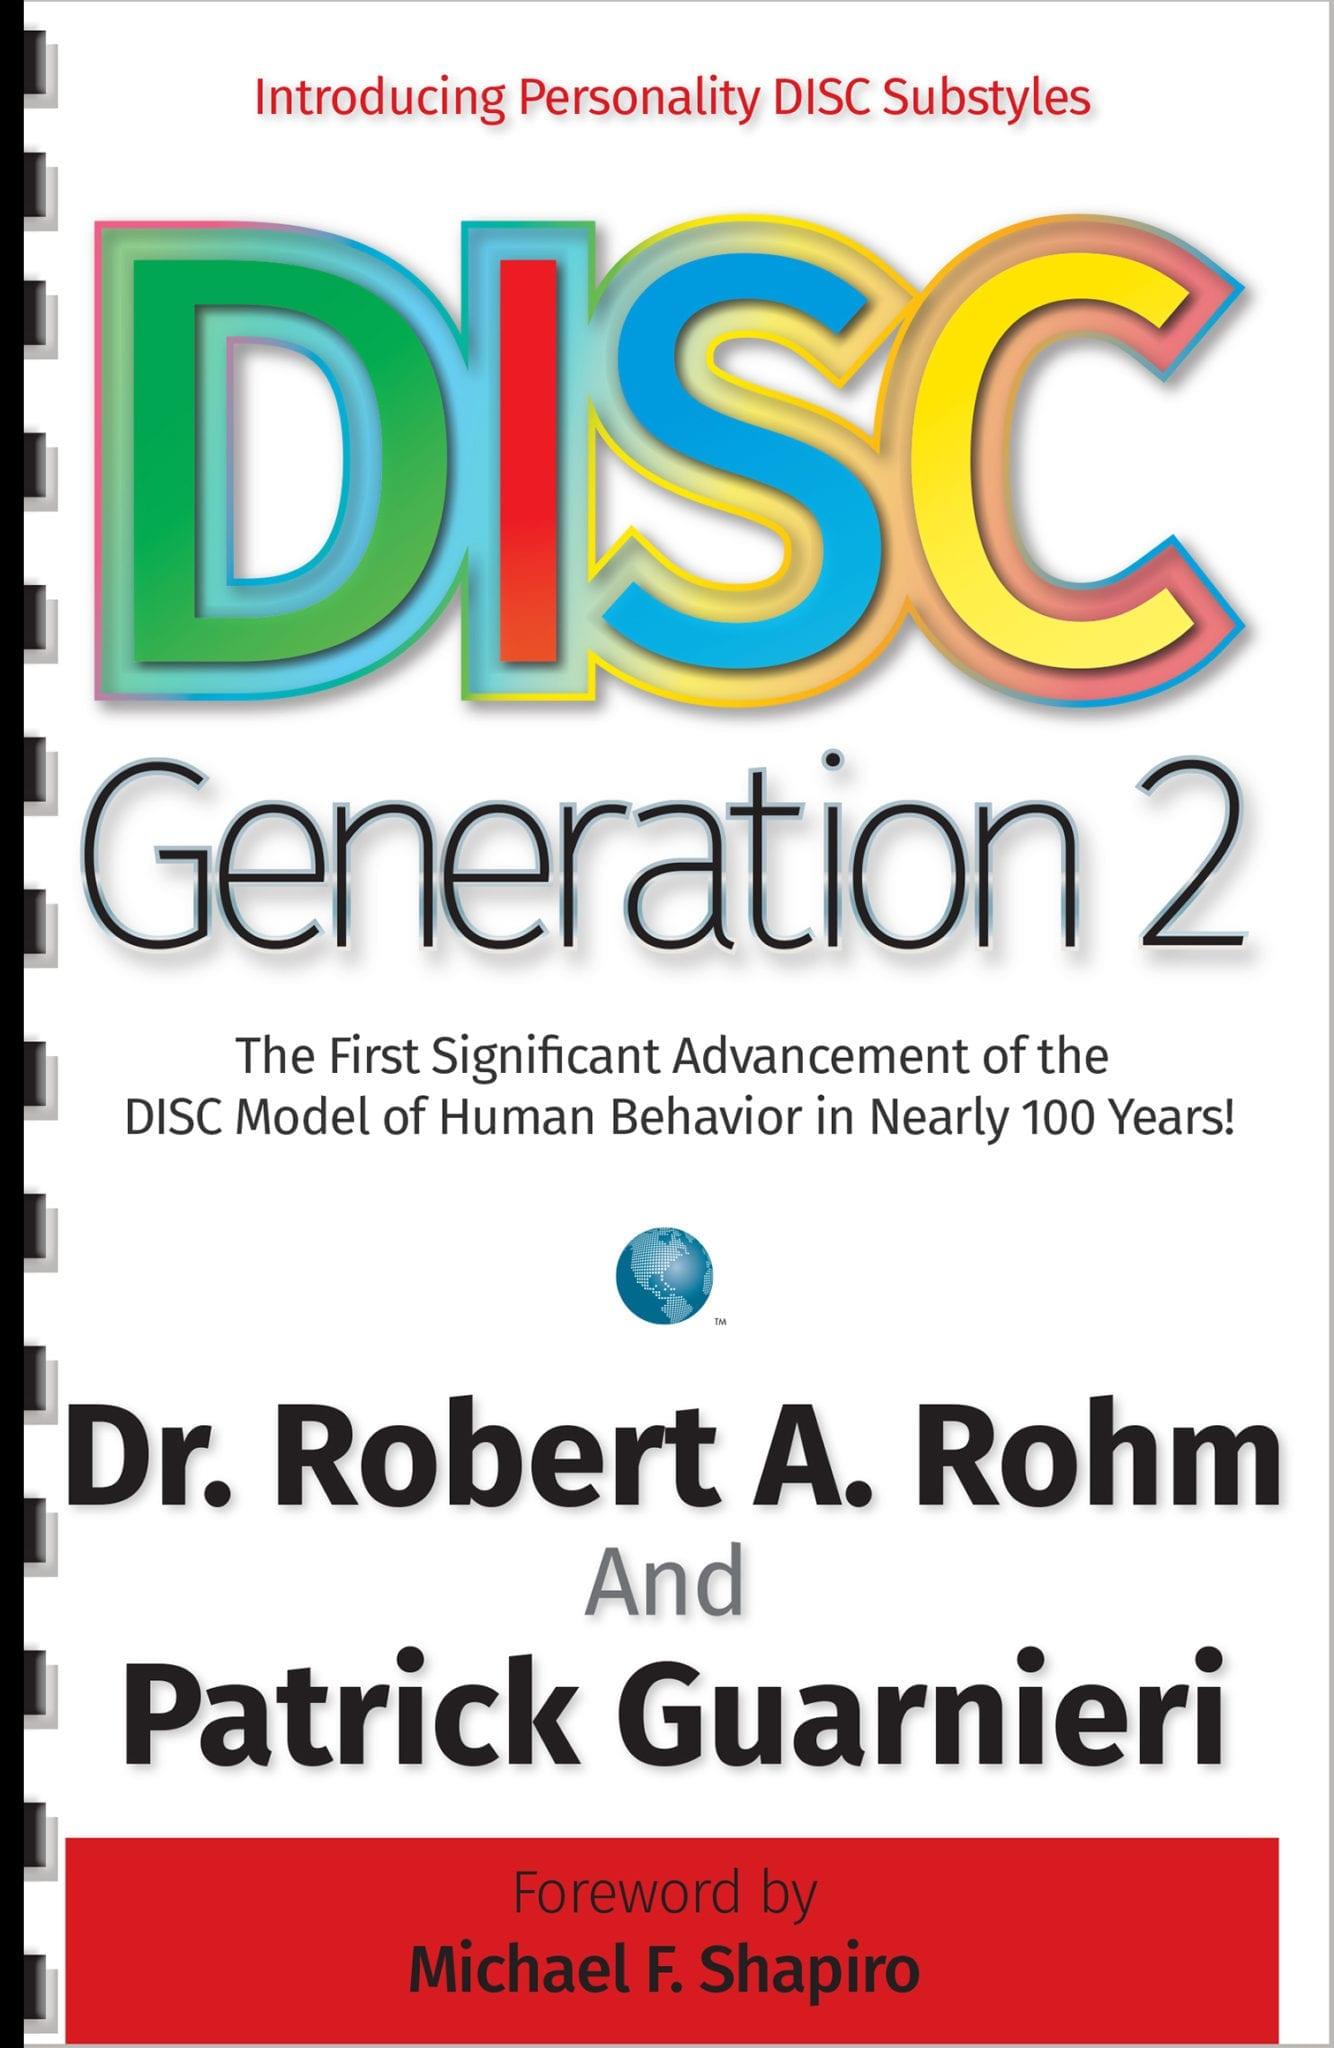 DISC Generation 2